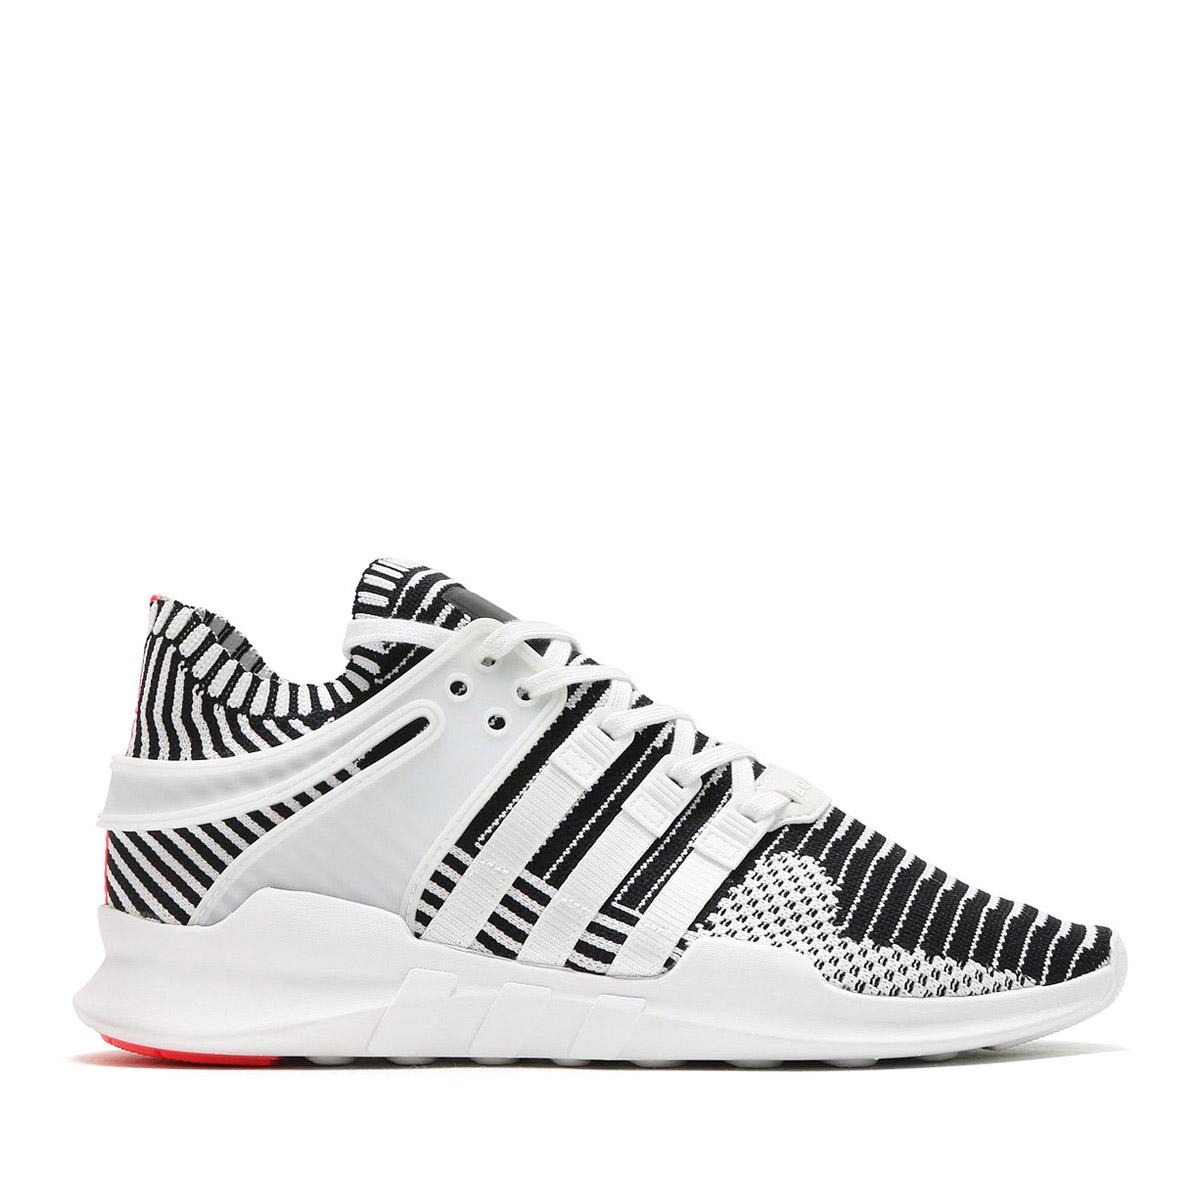 size 40 99f19 6db95 adidas Originals EQT SUPPORT ADV PK (Adidas original Sue ticket men Tosa  port) (Running White/Running White/Turbo) 17SS-I